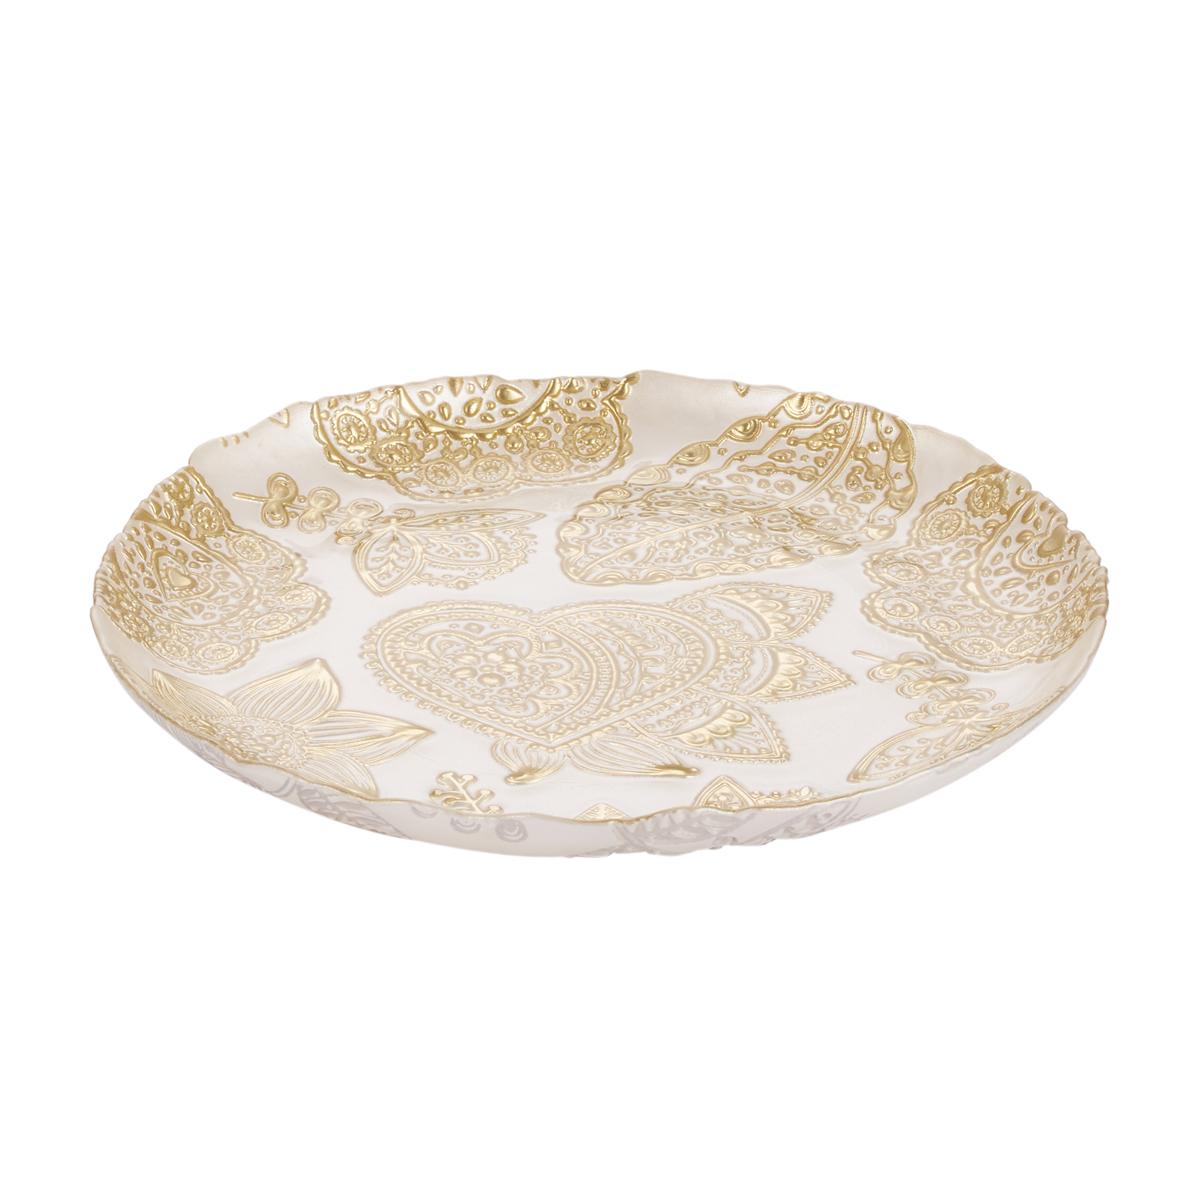 Картинка - Тарелка десертная GIPFEL CALISTA 41373 21 см